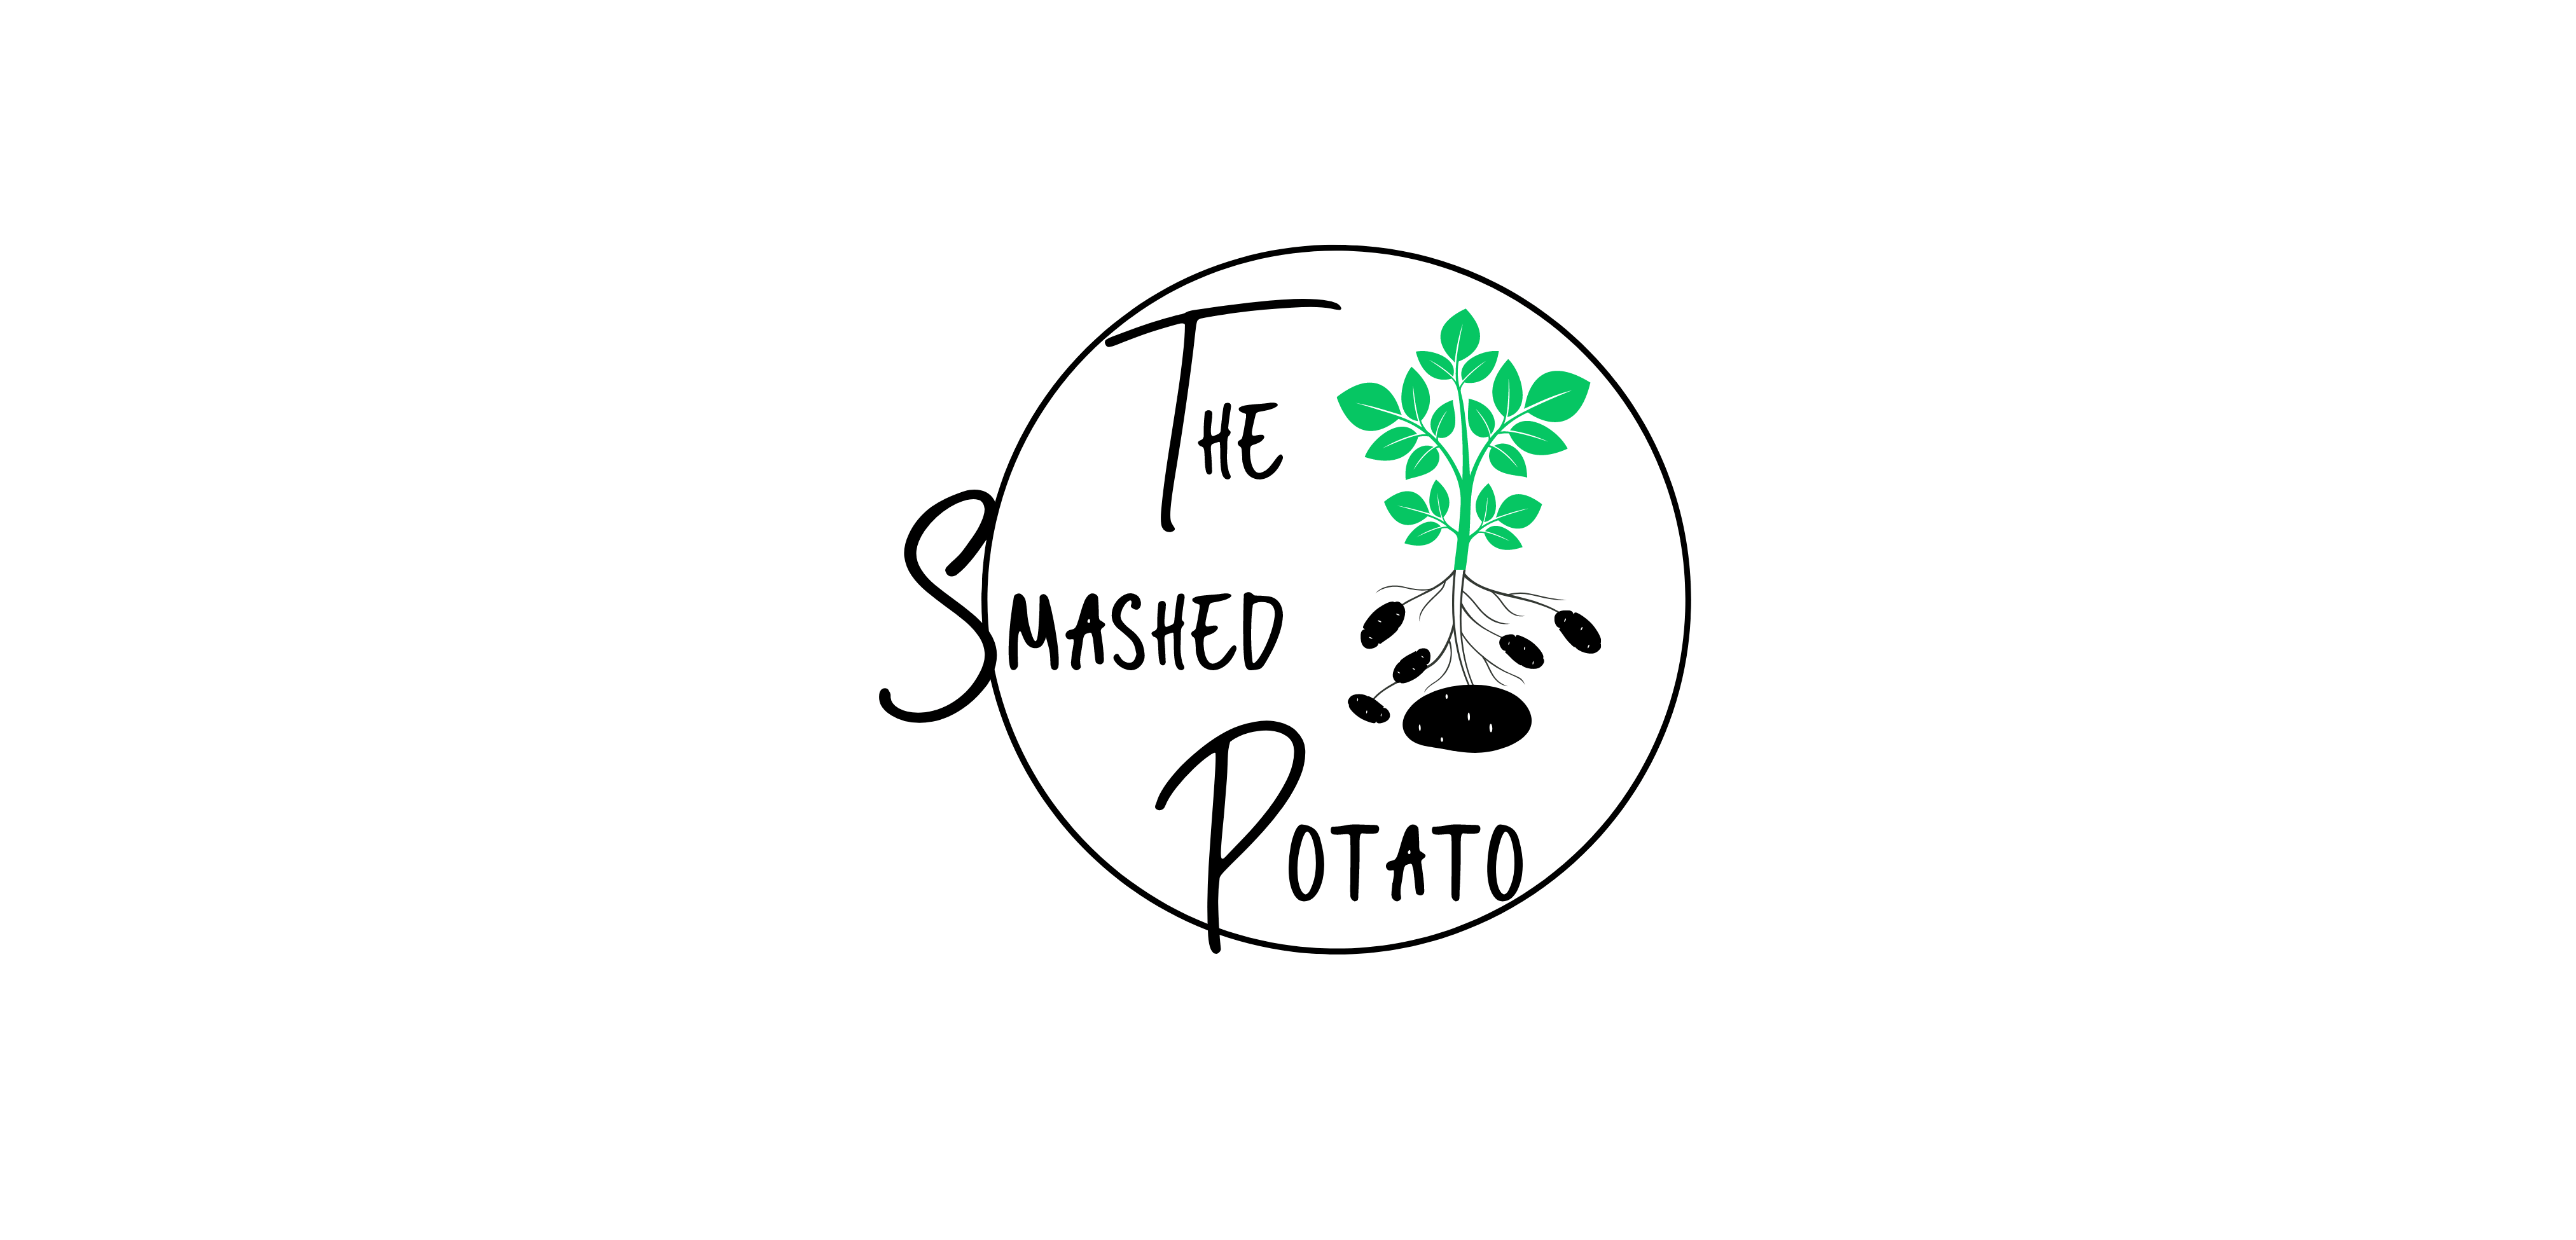 the smashed potato mini logo